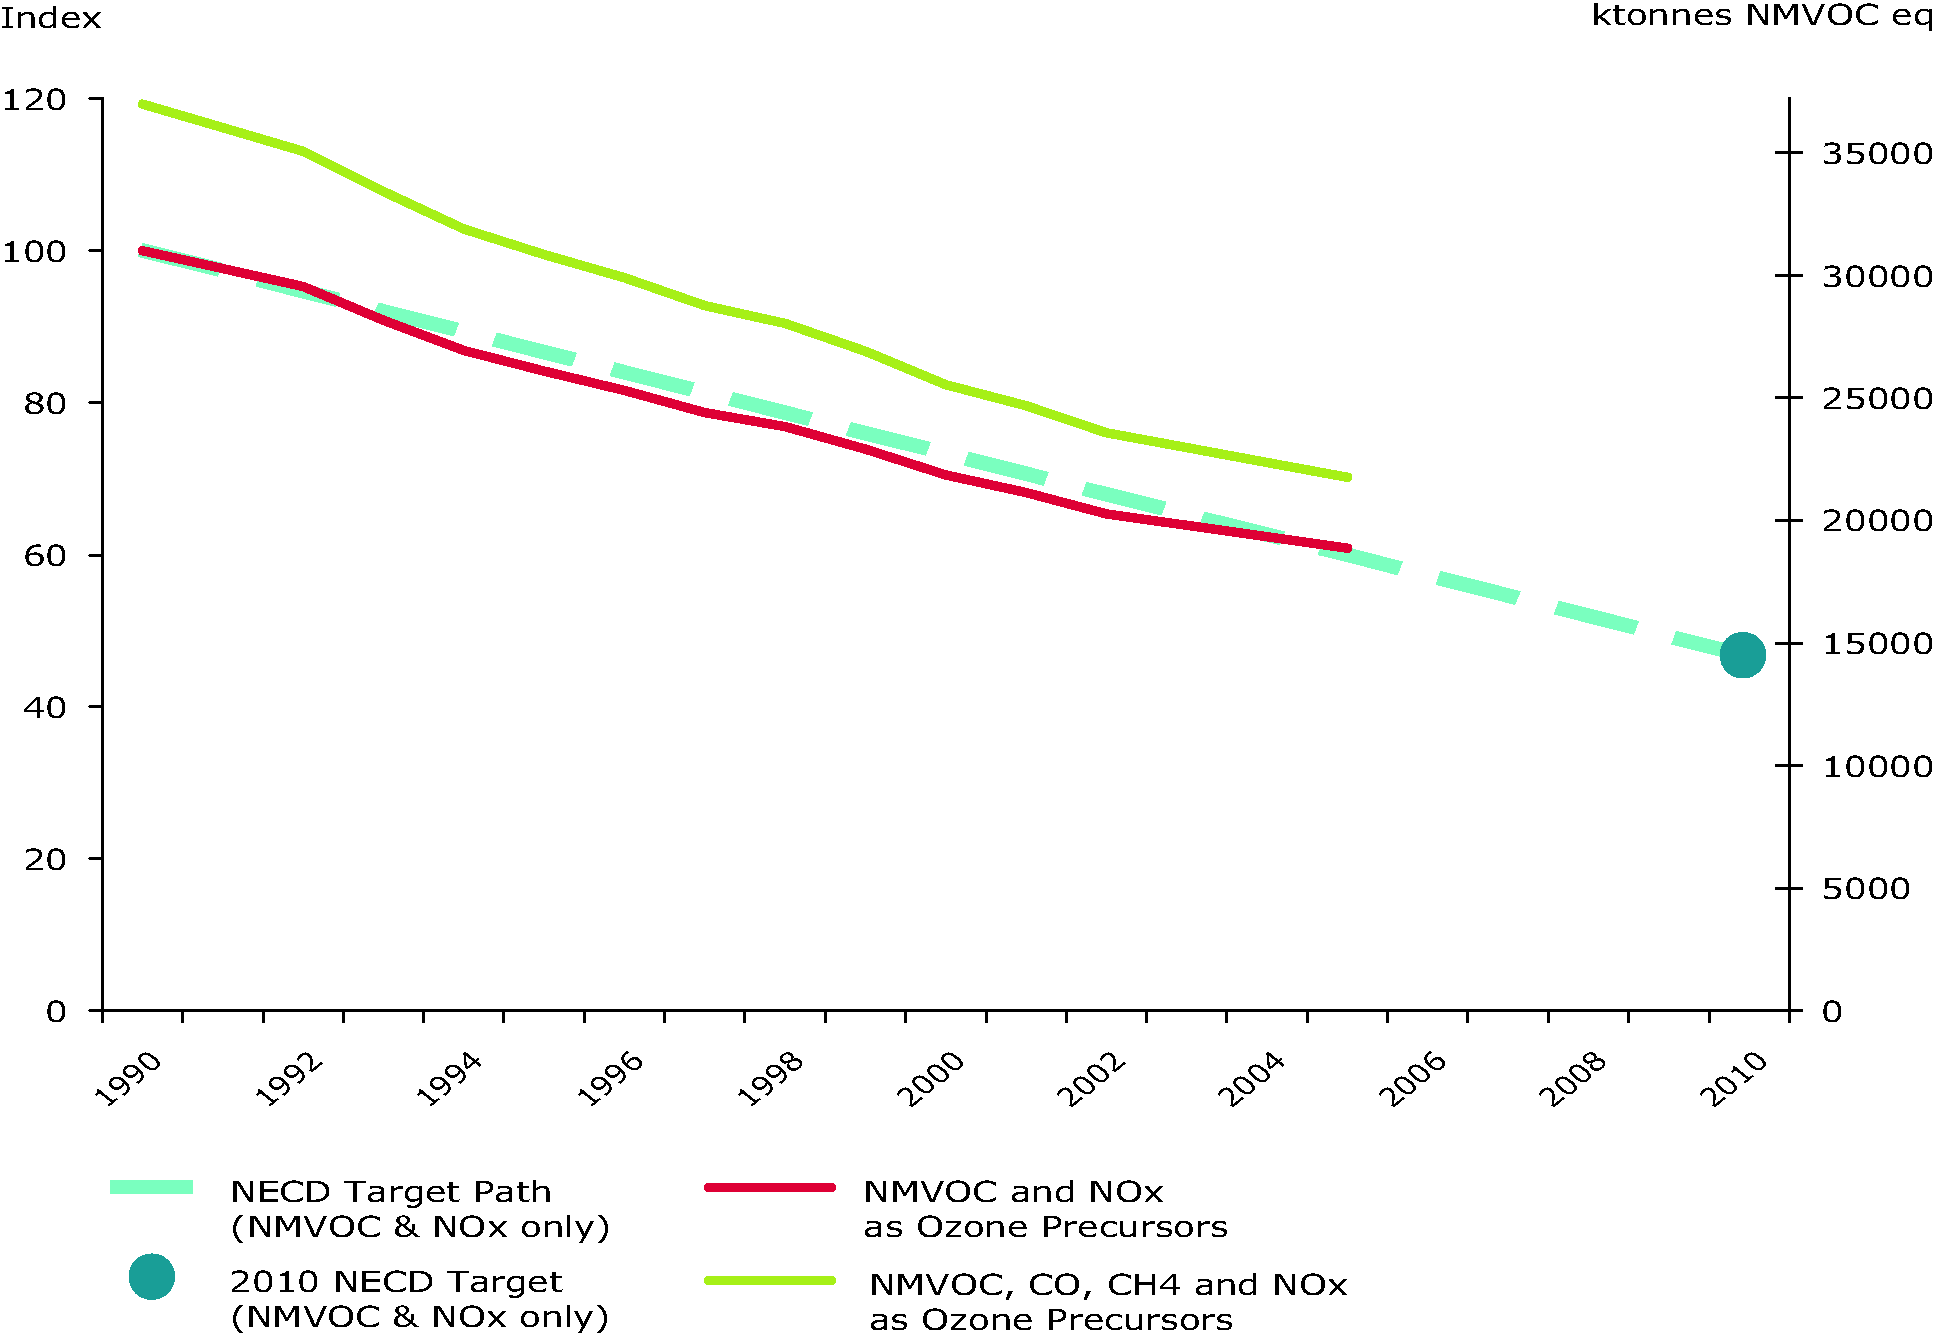 Emissions of ozone precursors (EU-15)